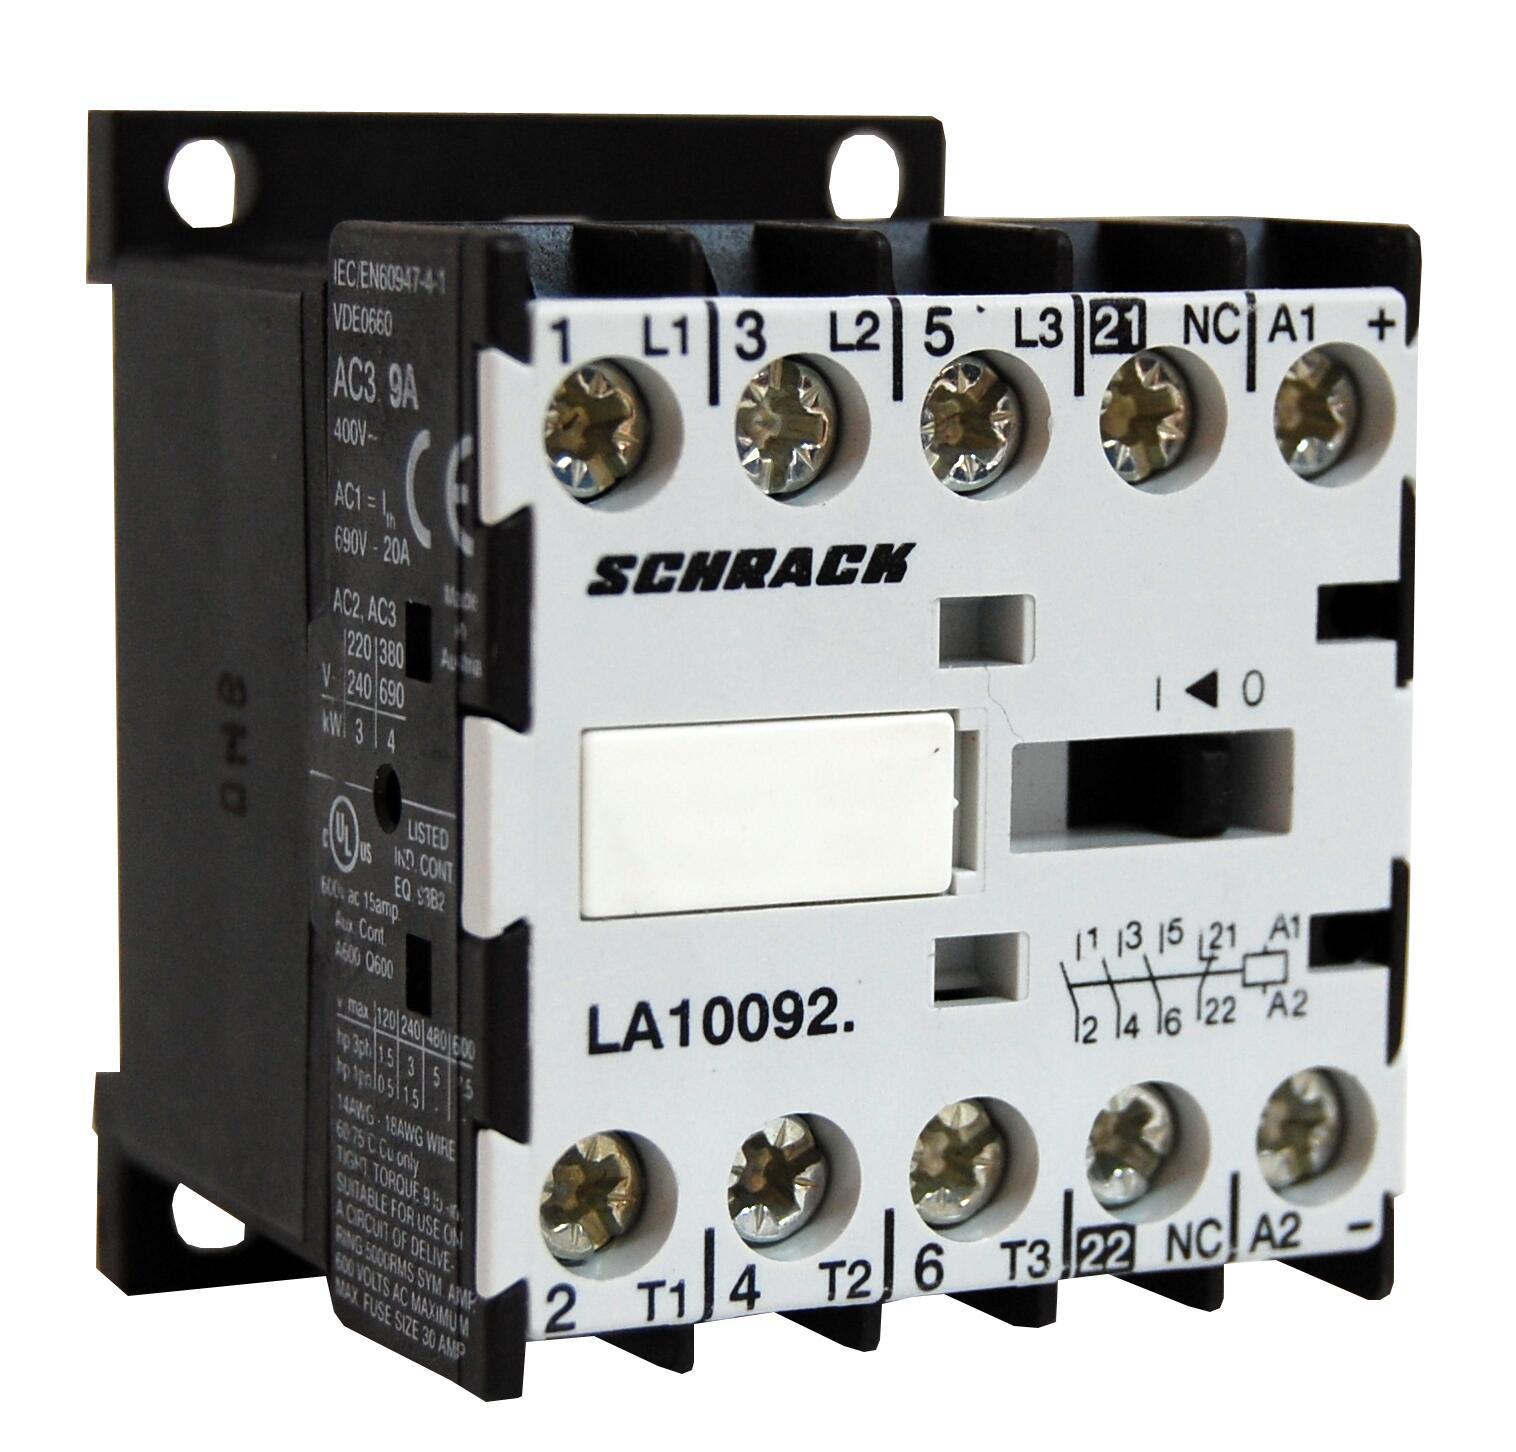 LA100925 - Schrack Technik